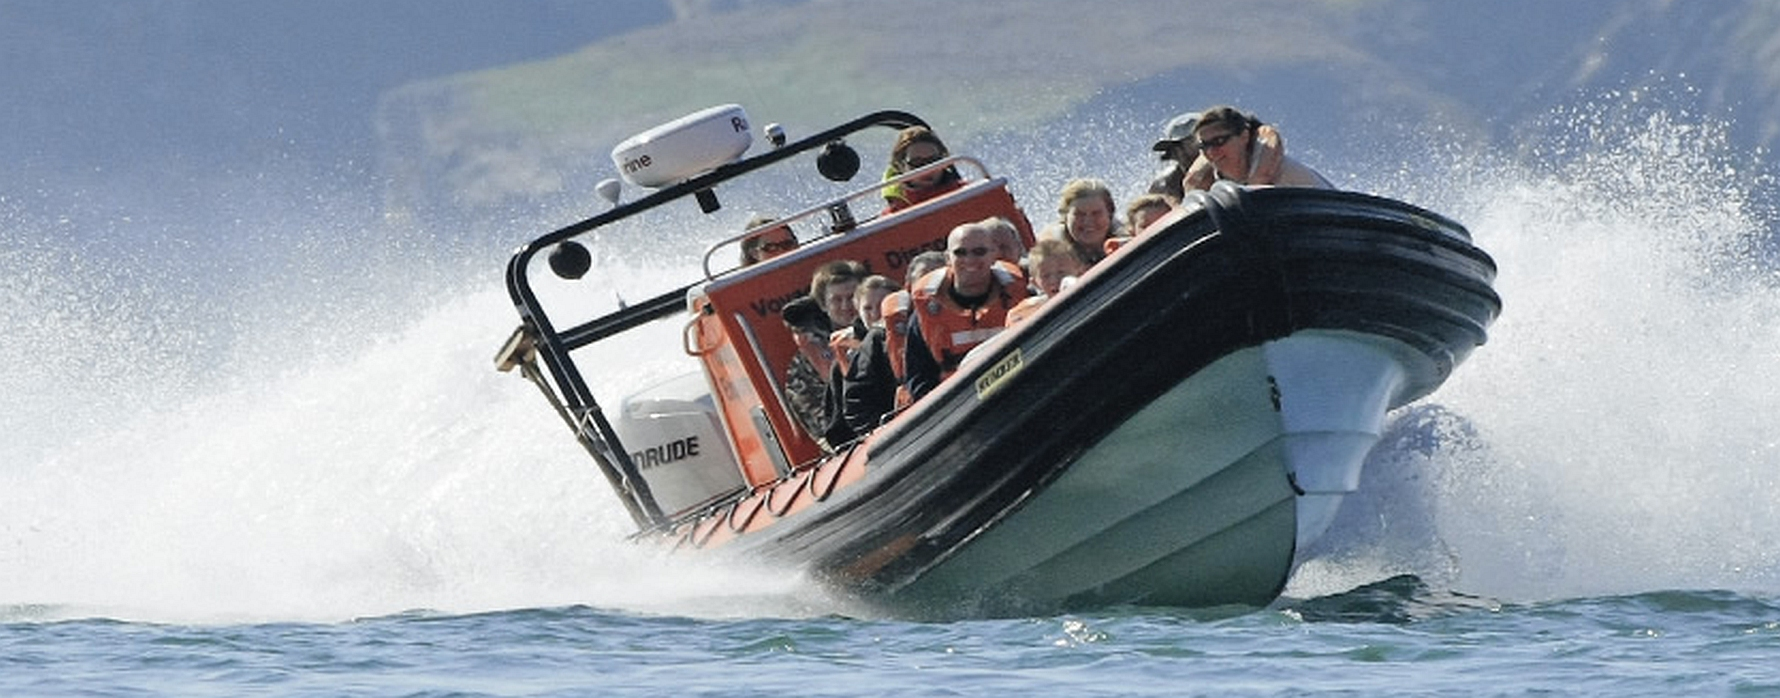 seaxplorer_glencoe_1780_698